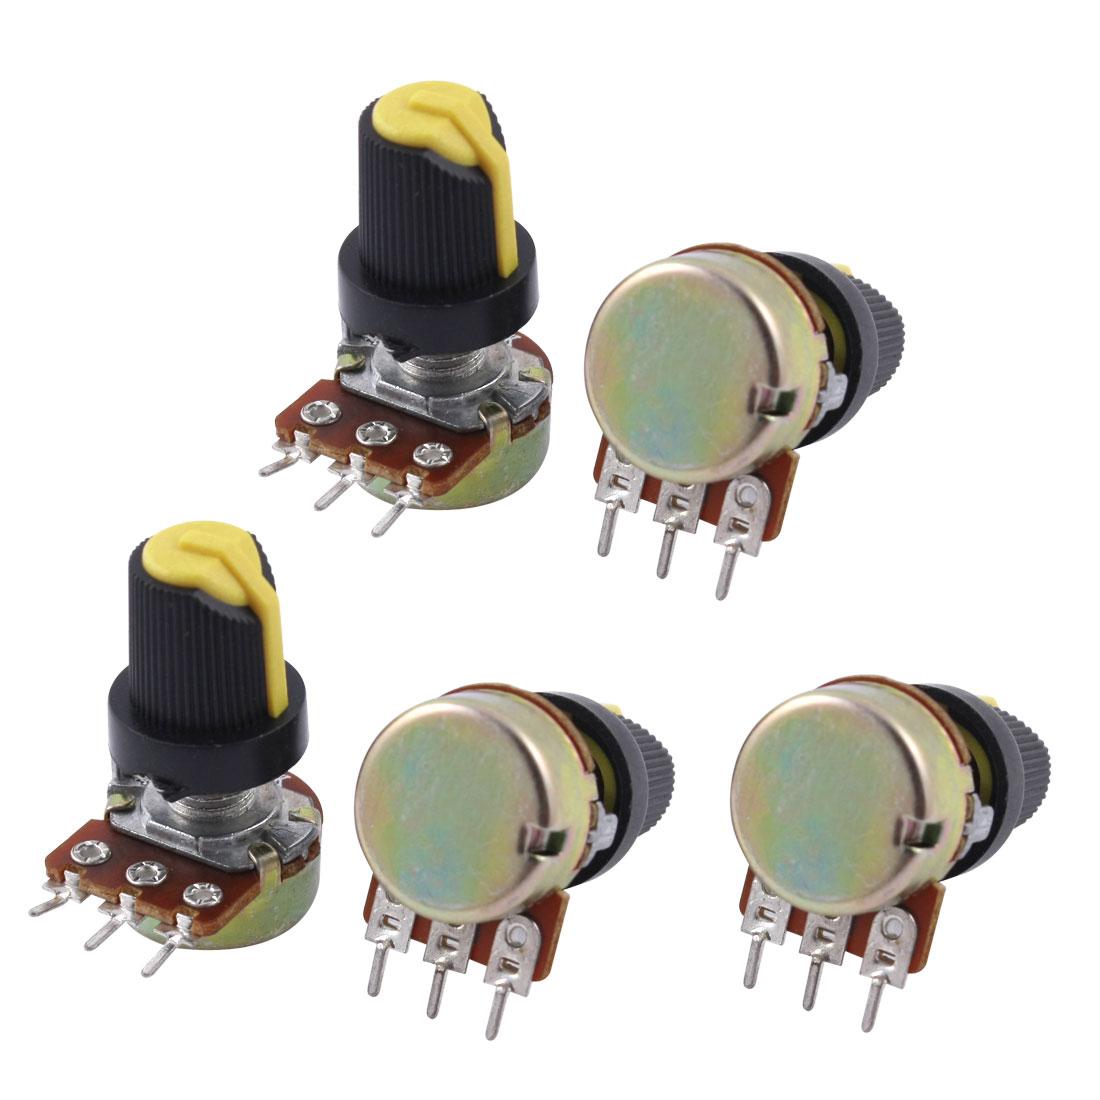 5Pcs B50K 50K Ohm 3 Terminals Rotary Audio Single Linear Potentiometer Pot